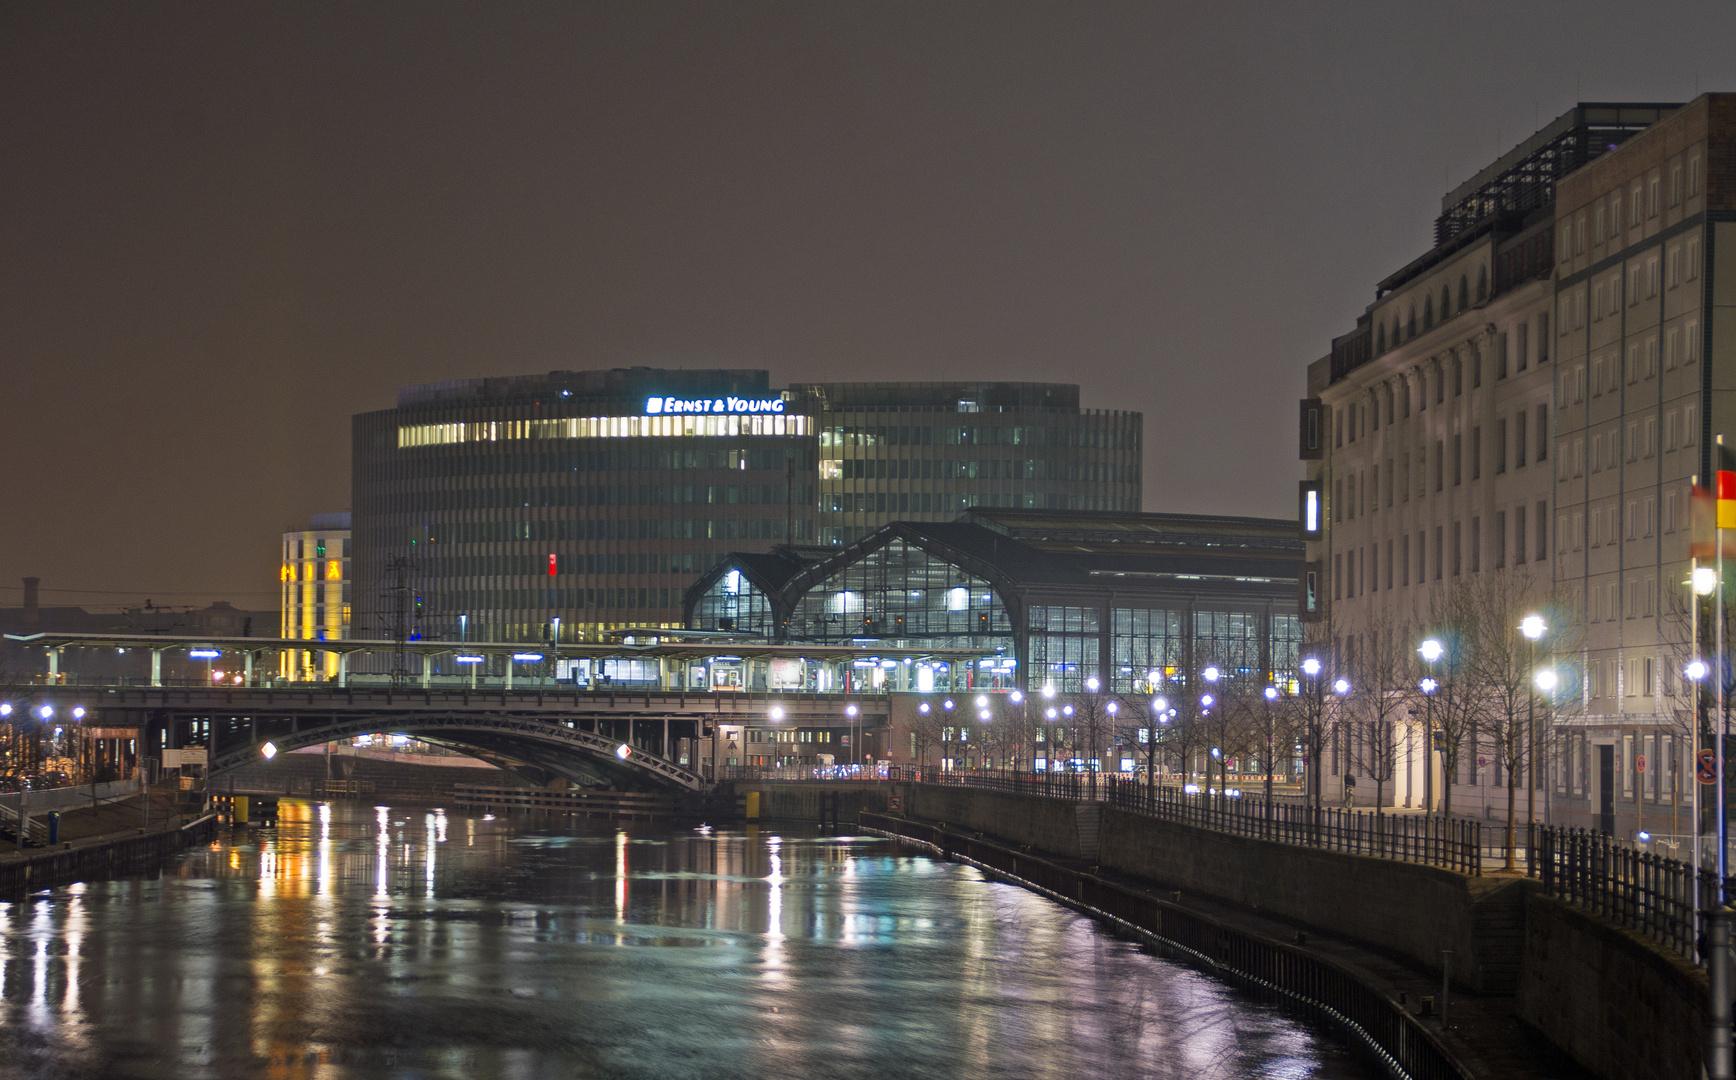 Bahnhof Berlin Friedrichstrasse